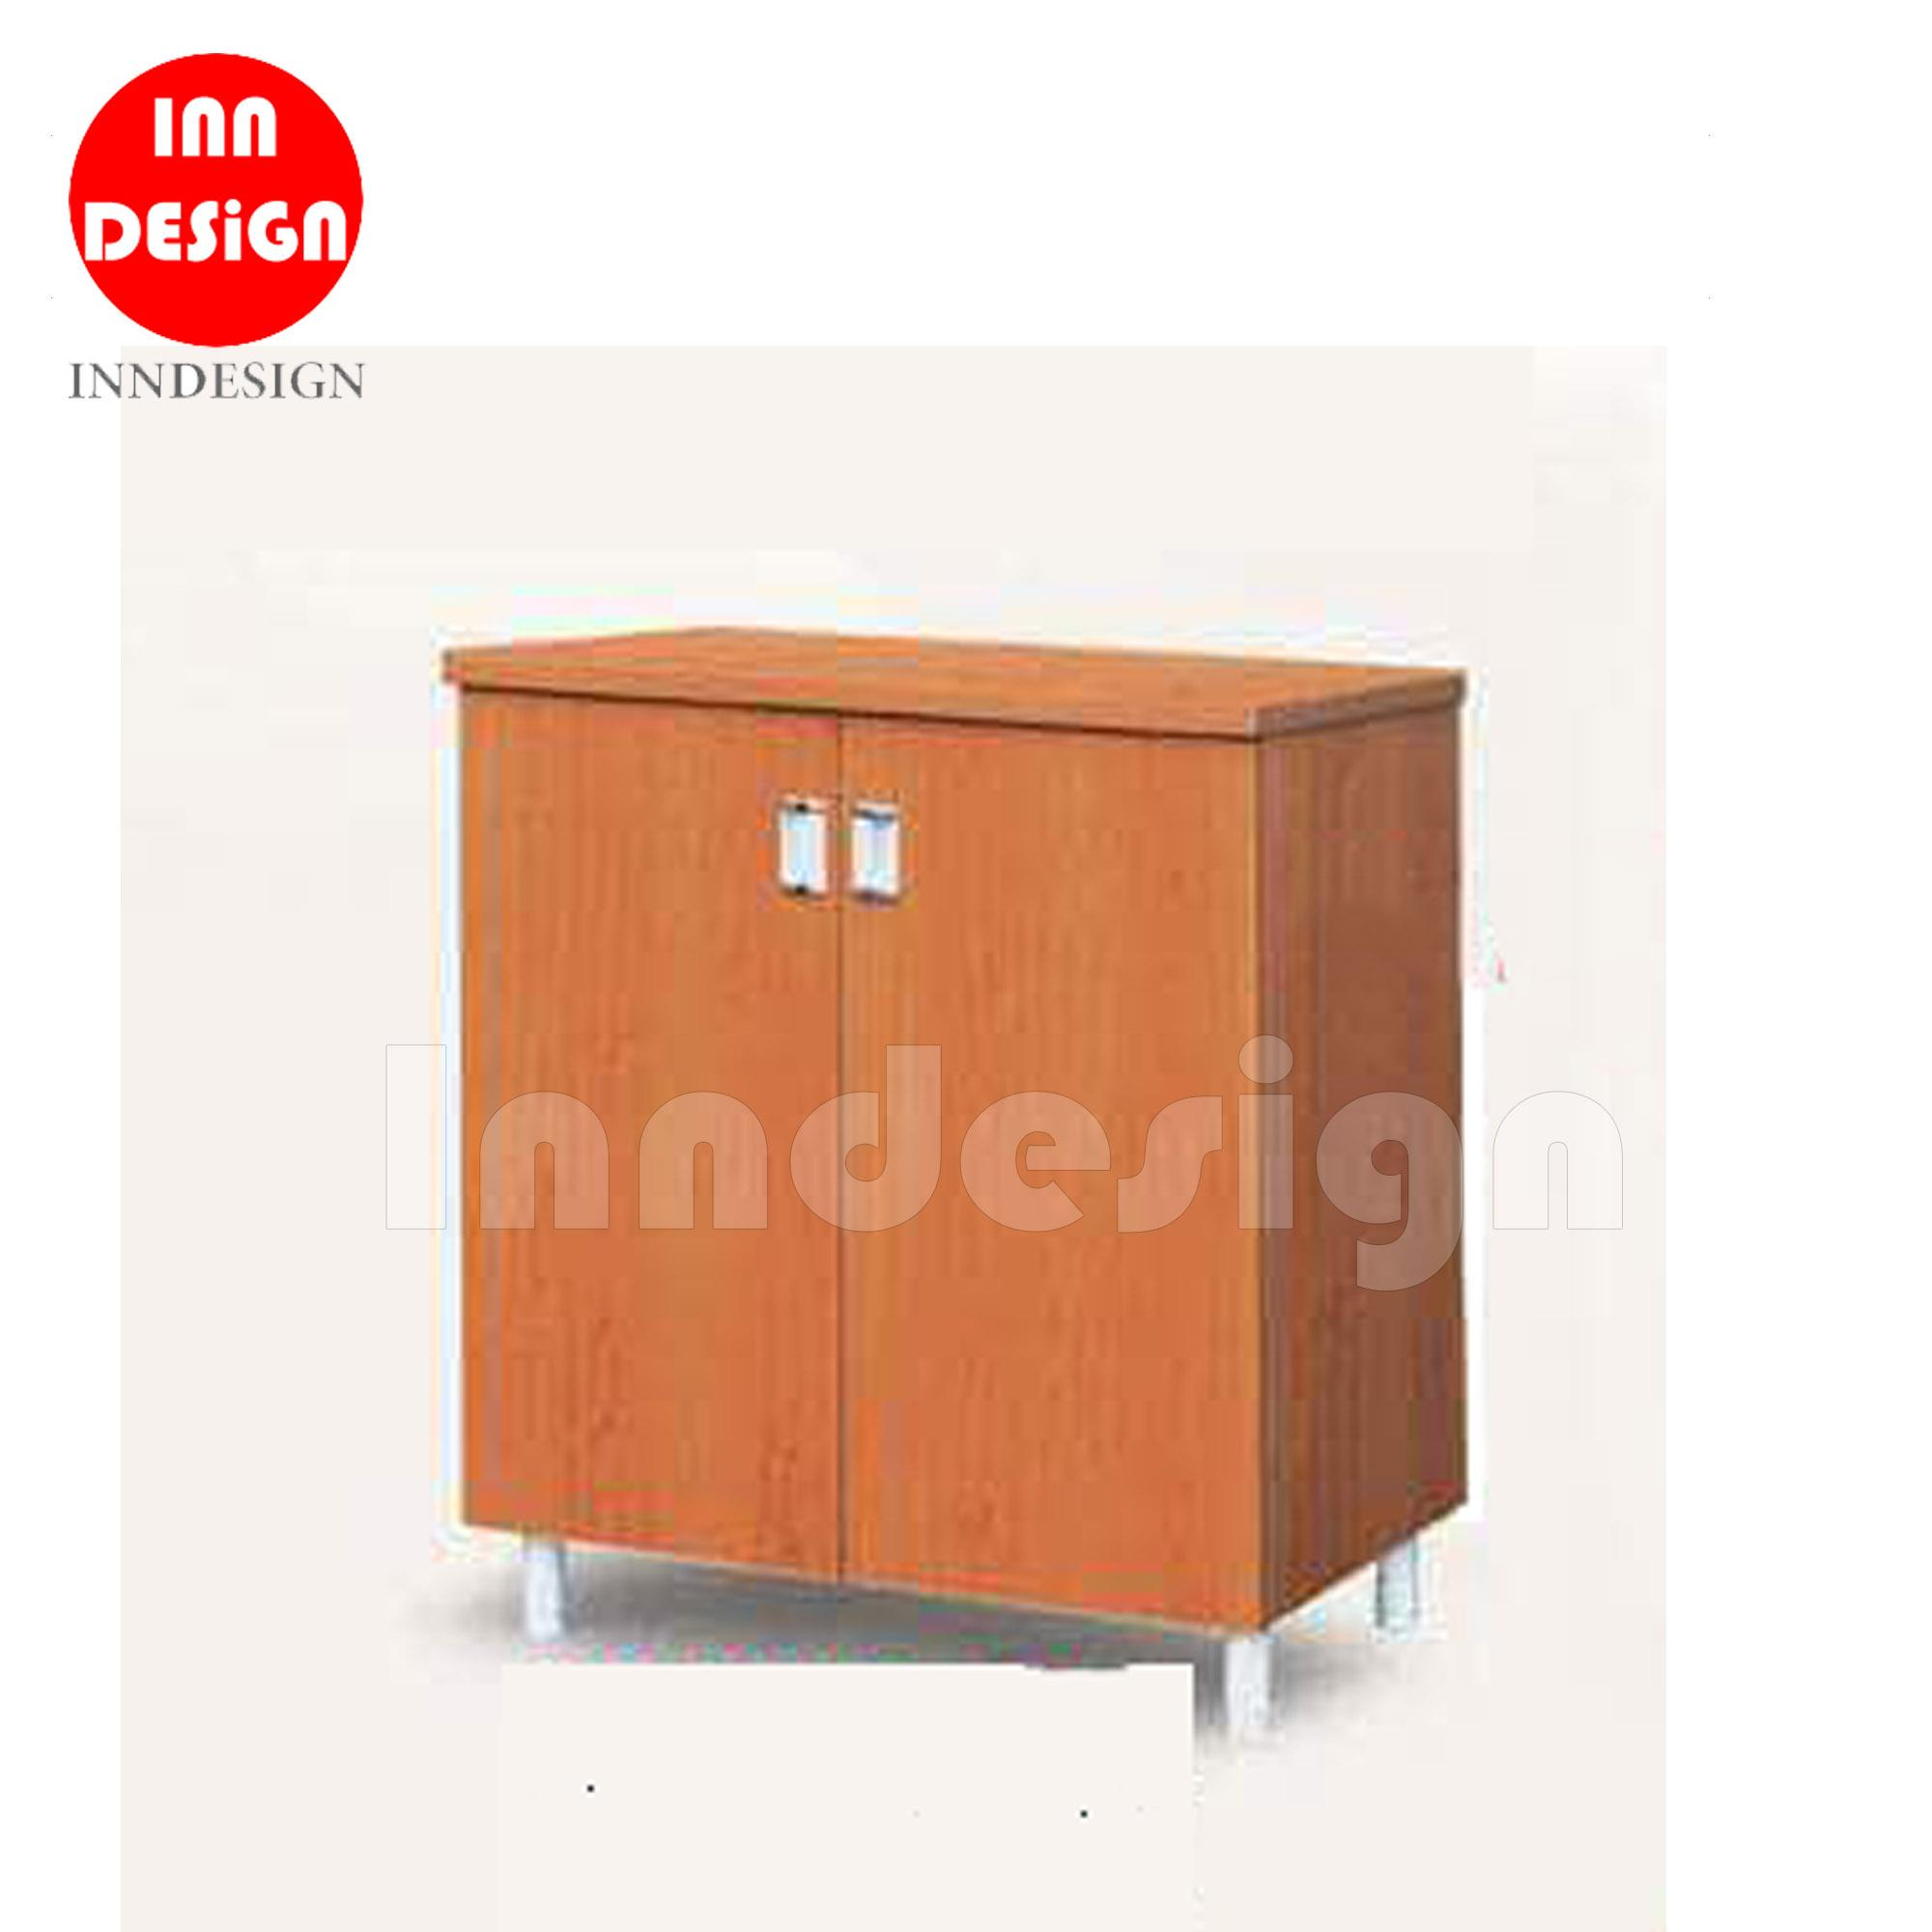 Vicky 2 Doors Kitchen Cabinet